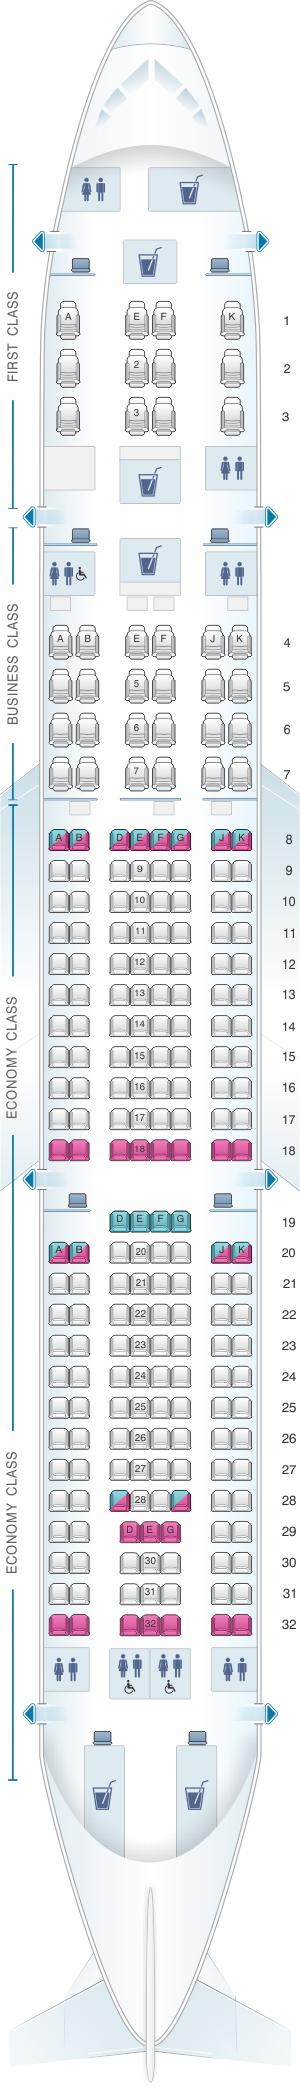 Seat map for Qatar Airways Airbus A330 200 228pax